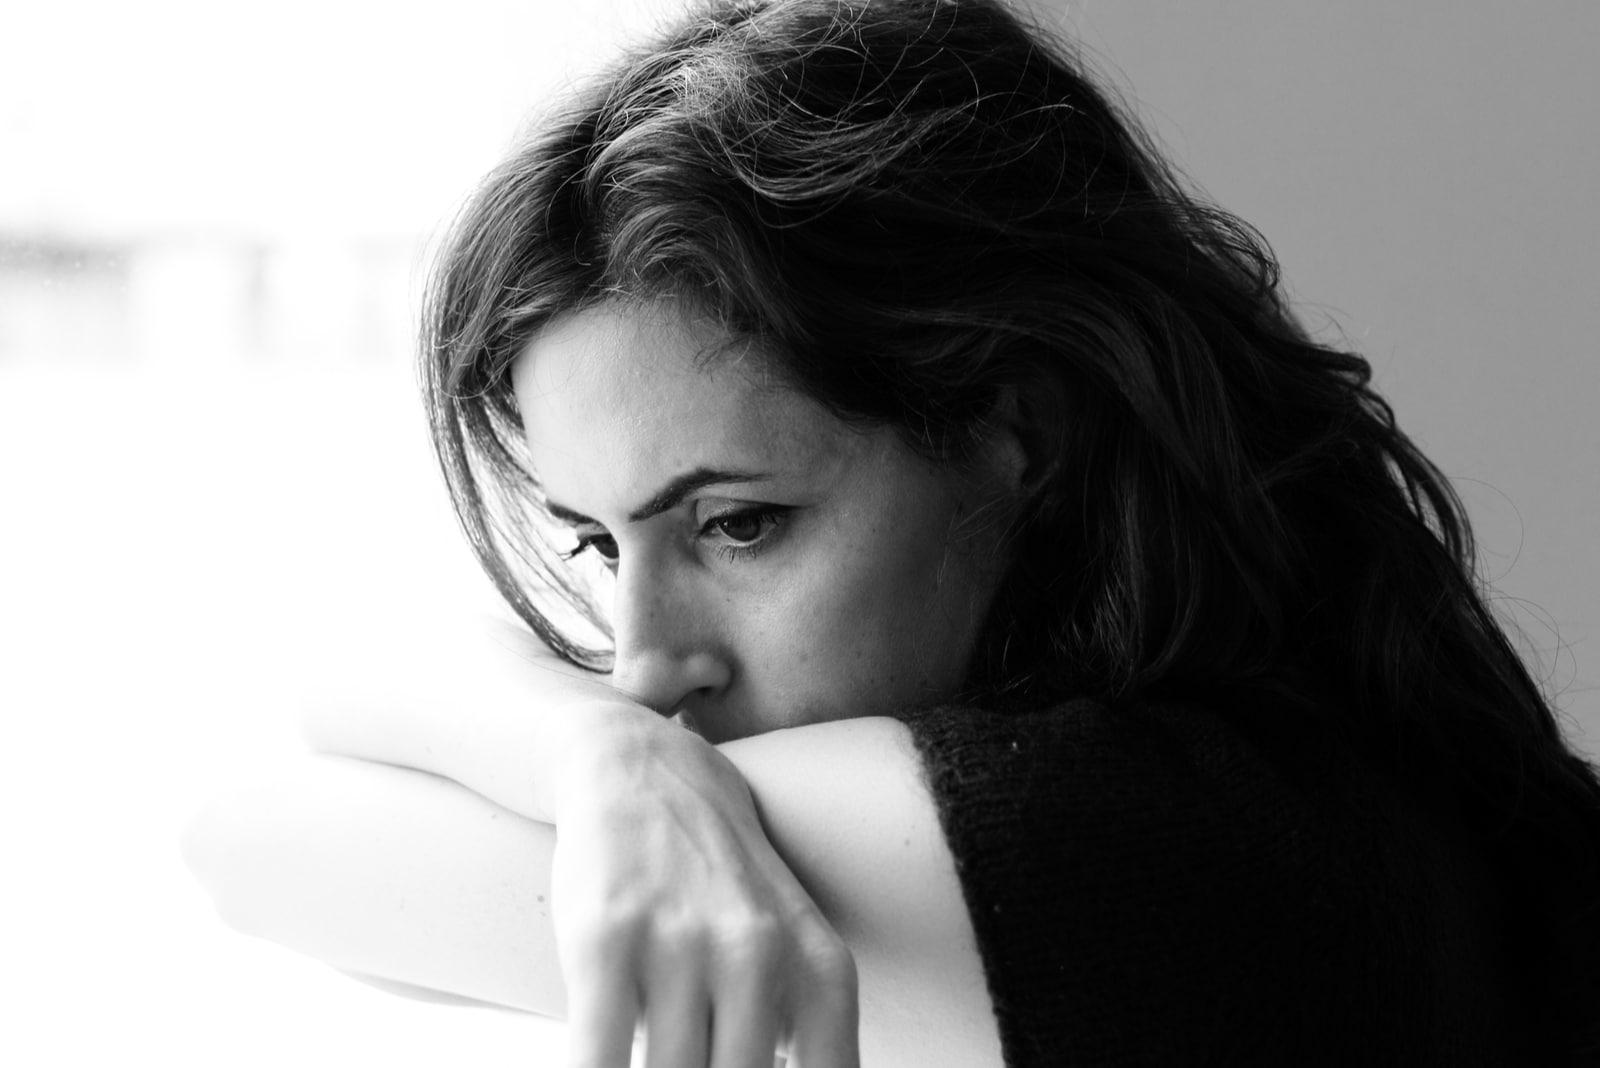 pensive woman sitting alone